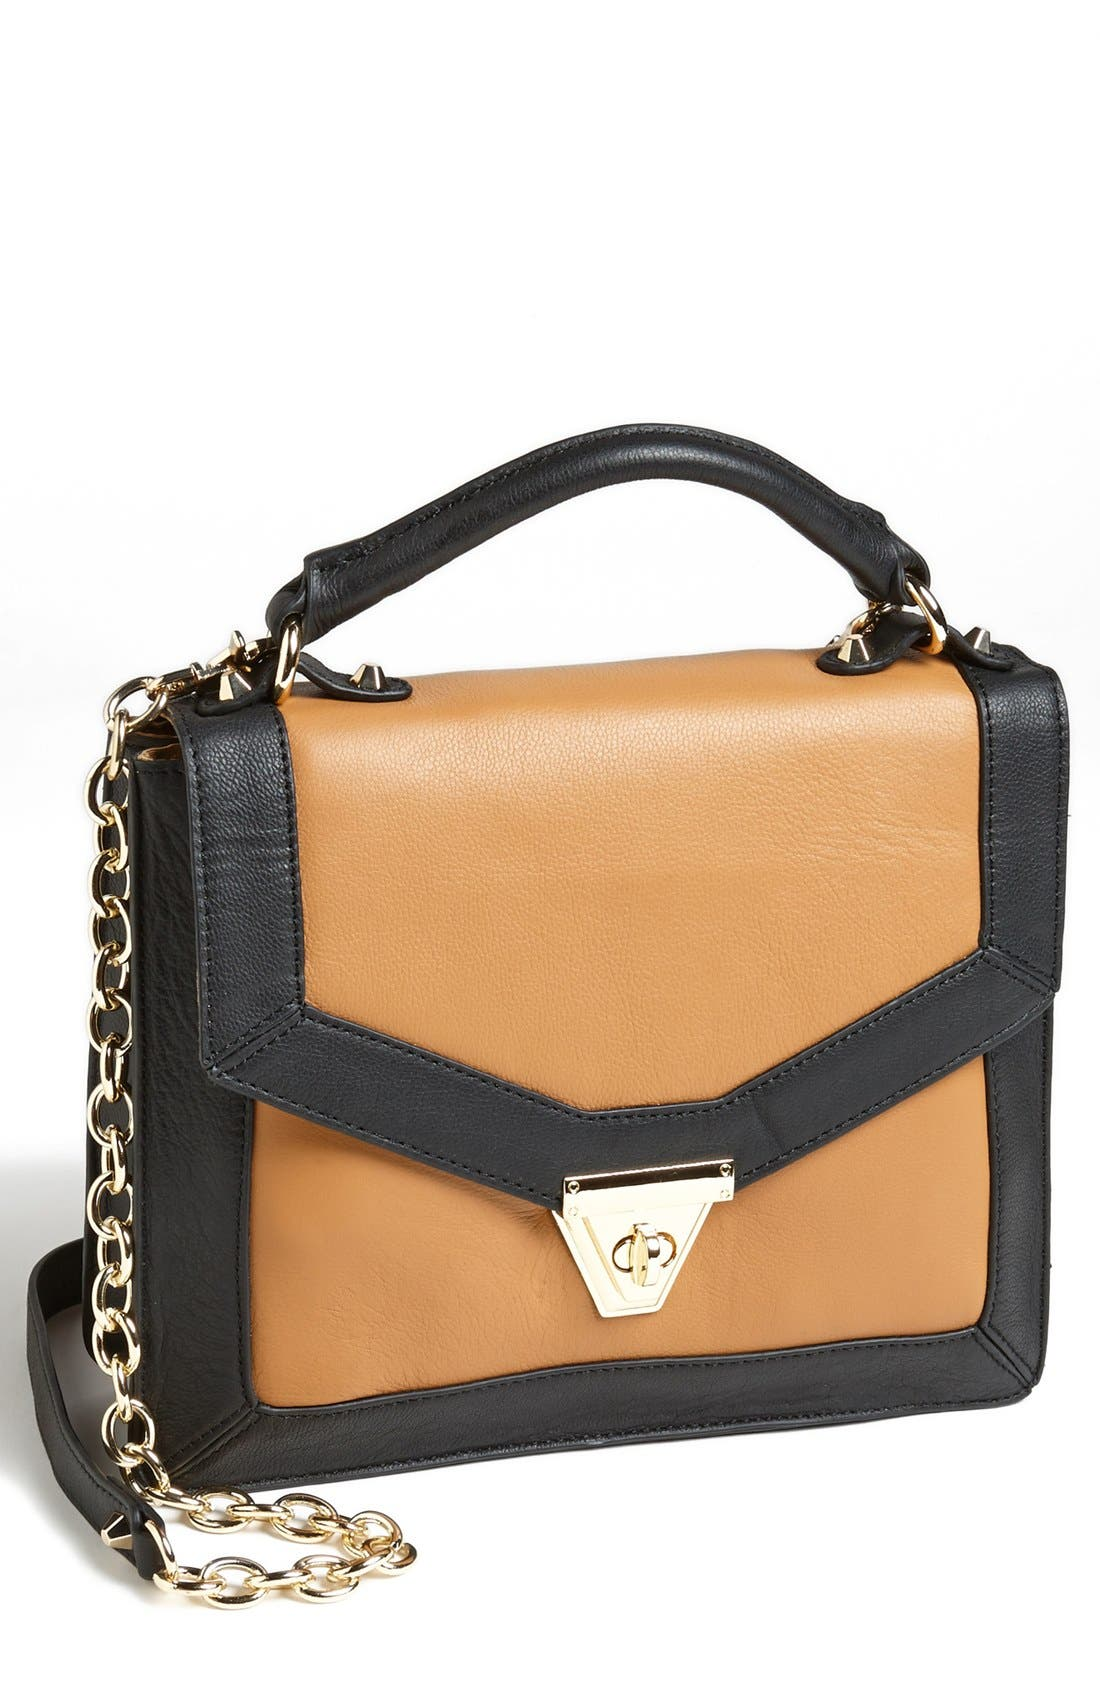 Alternate Image 1 Selected - Sole Society 'Lisette - Medium' Shoulder Bag